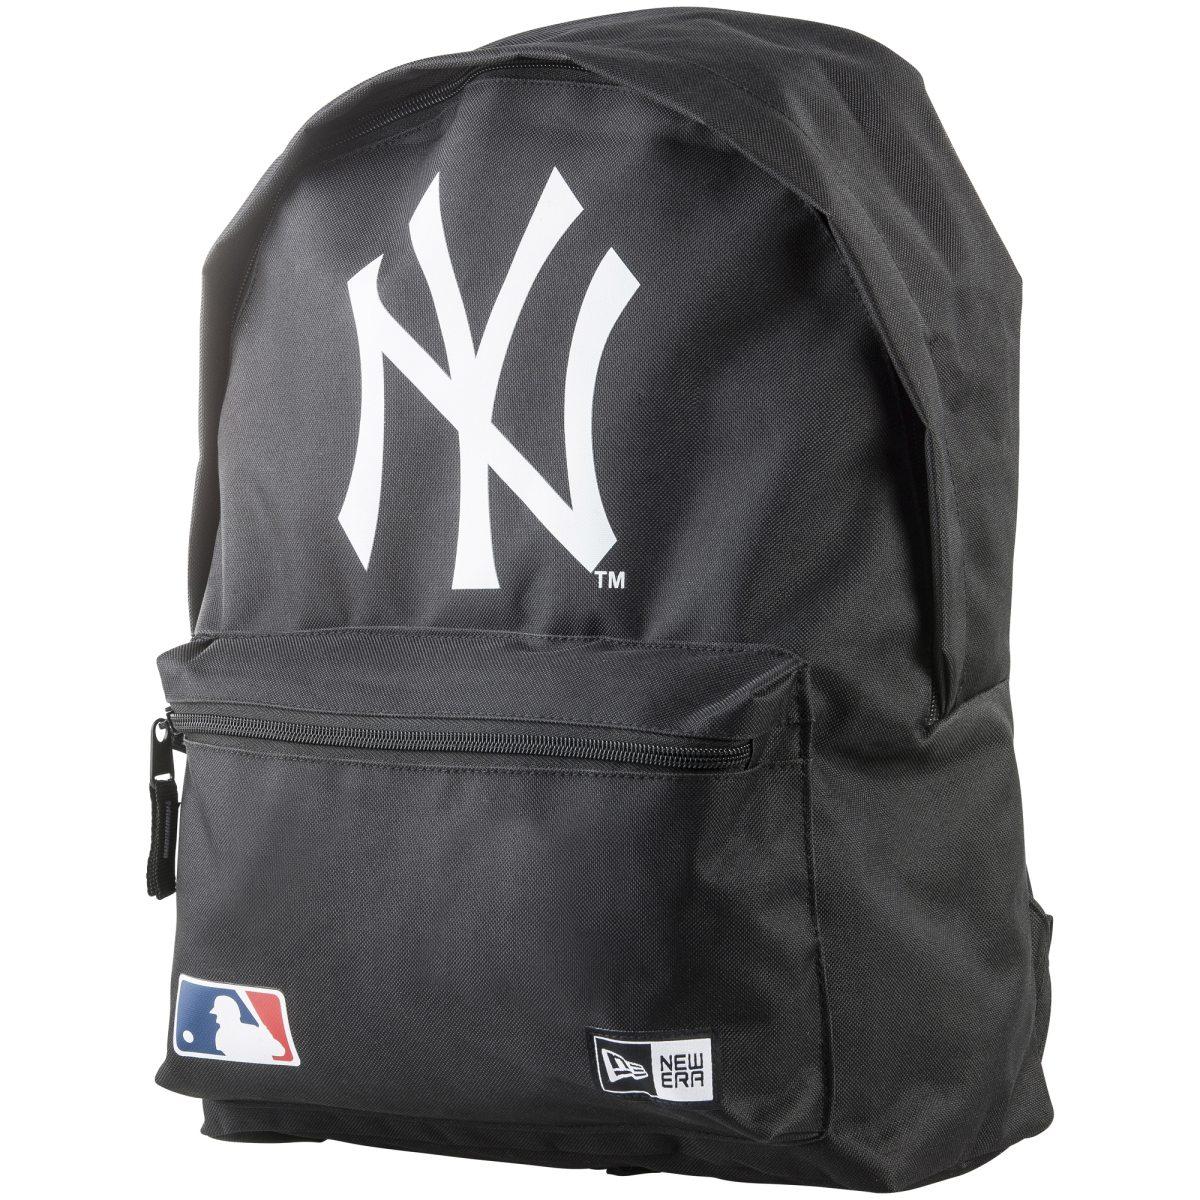 york yankees ryggsäck camouflage finns på .